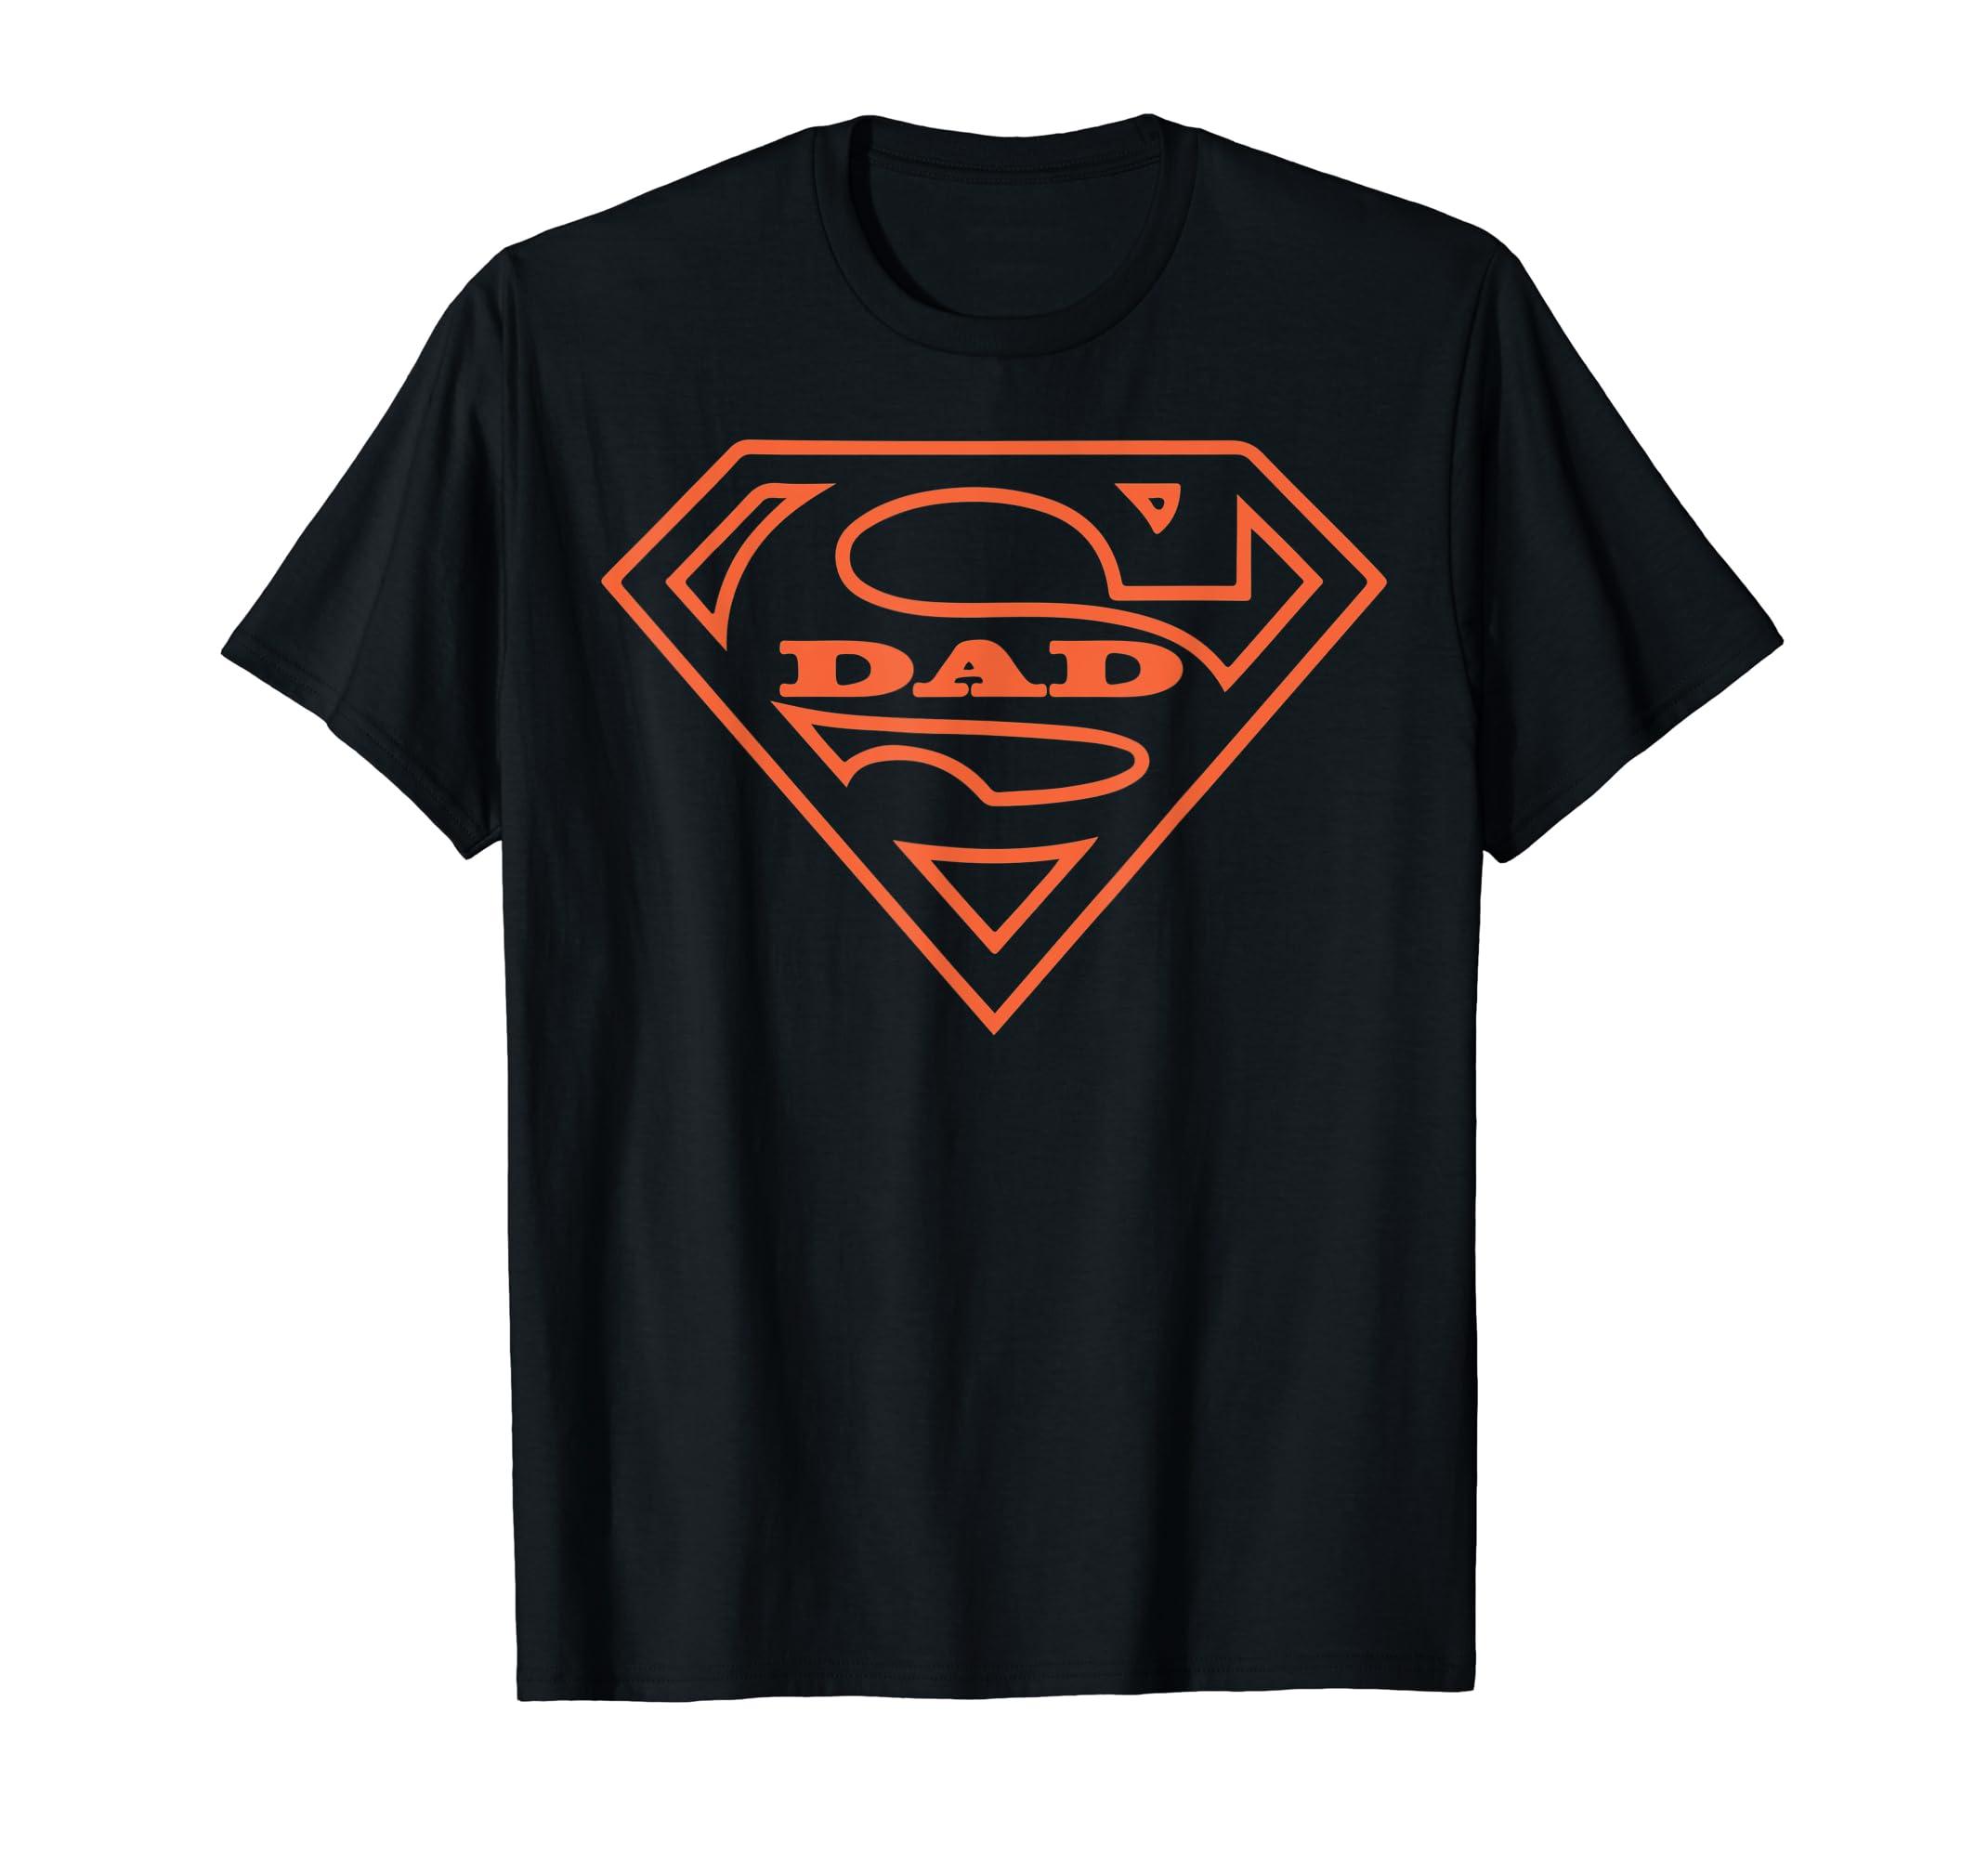 Super Dad T Shirt Father's Day Orange Cool Gift Men Tee-Men's T-Shirt-Black